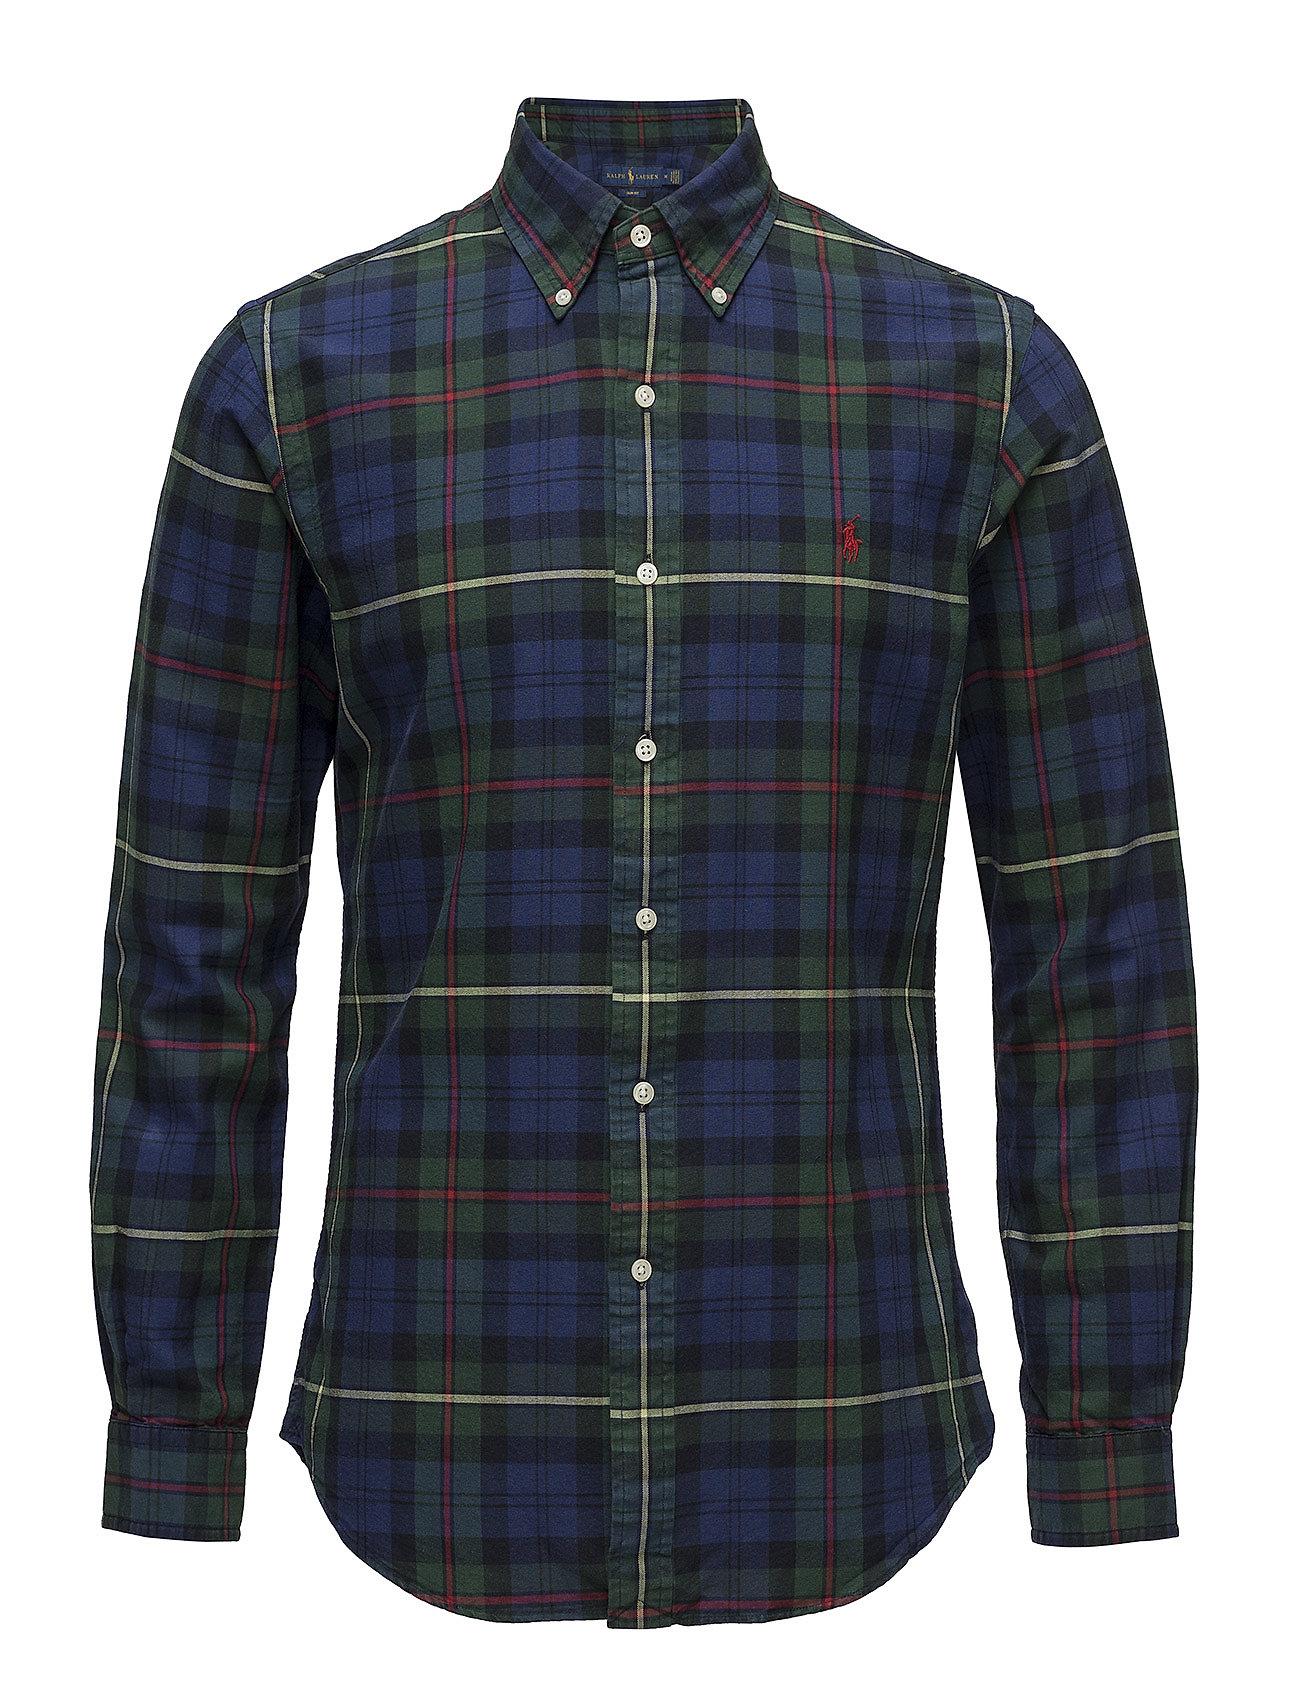 Slim Fit Plaid Oxford Shirt (2905 Navy pine Mu) (£63) - Polo Ralph ... 66eadcba0a17